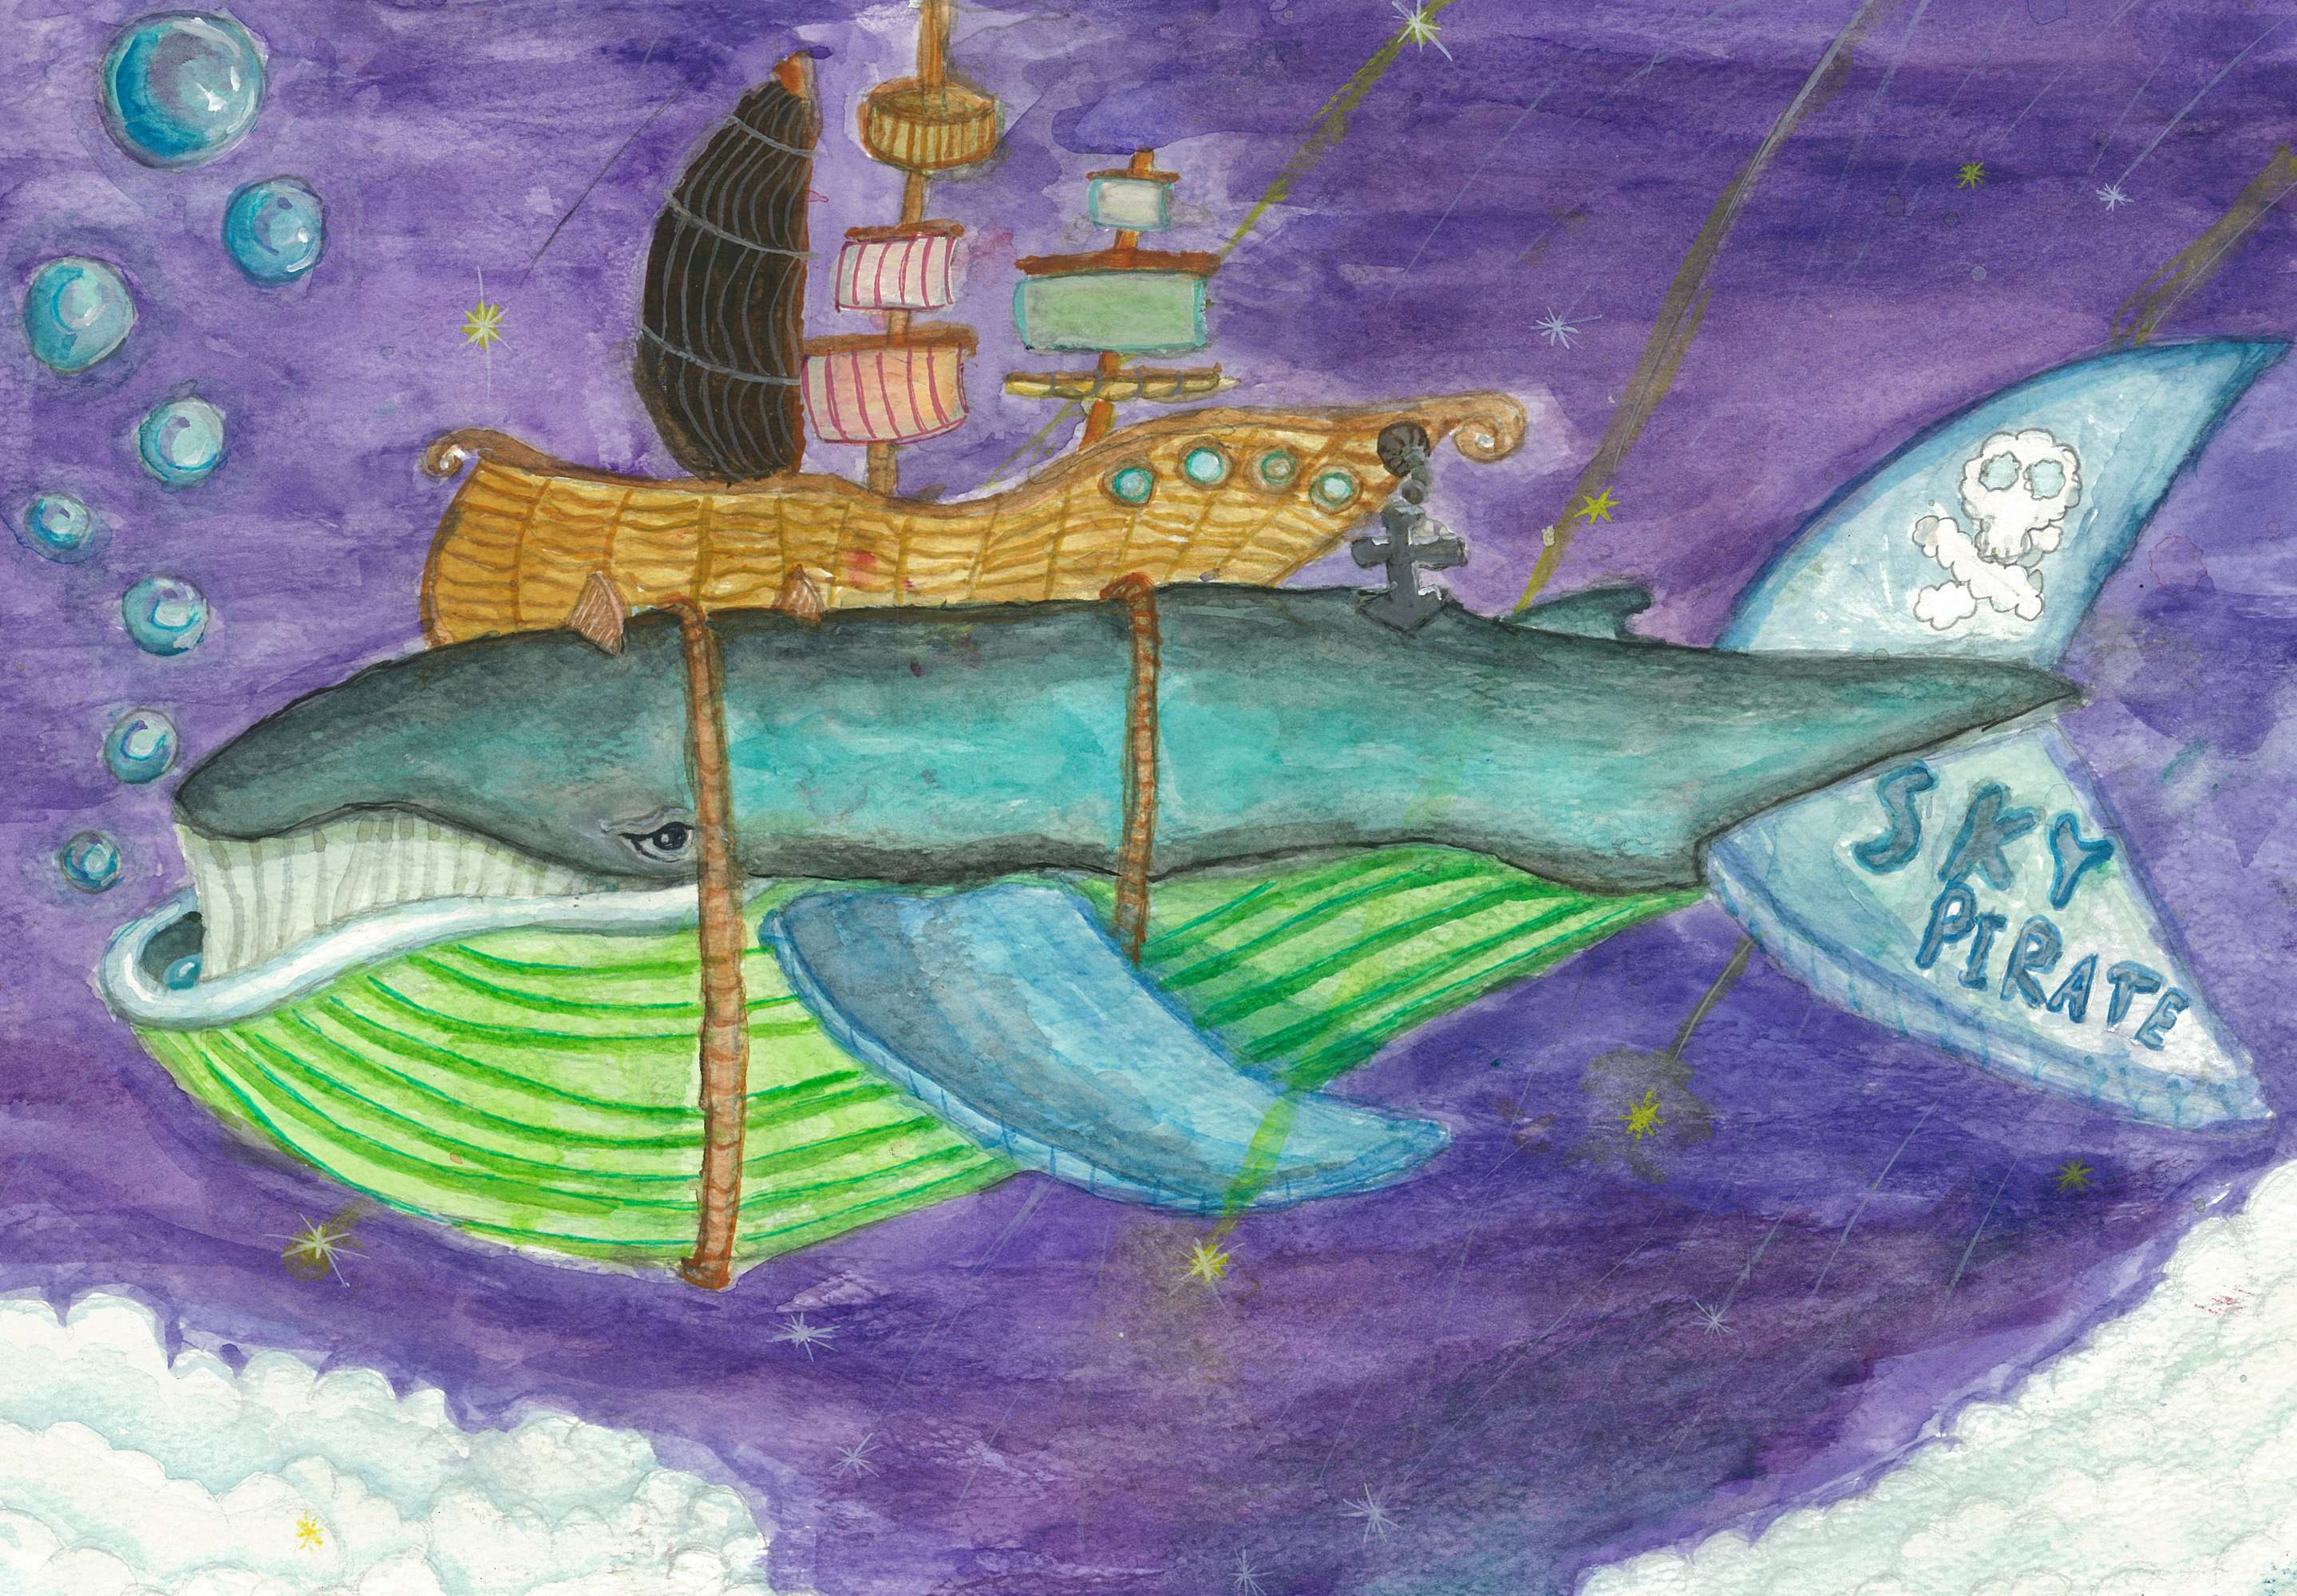 The Sky Pirate